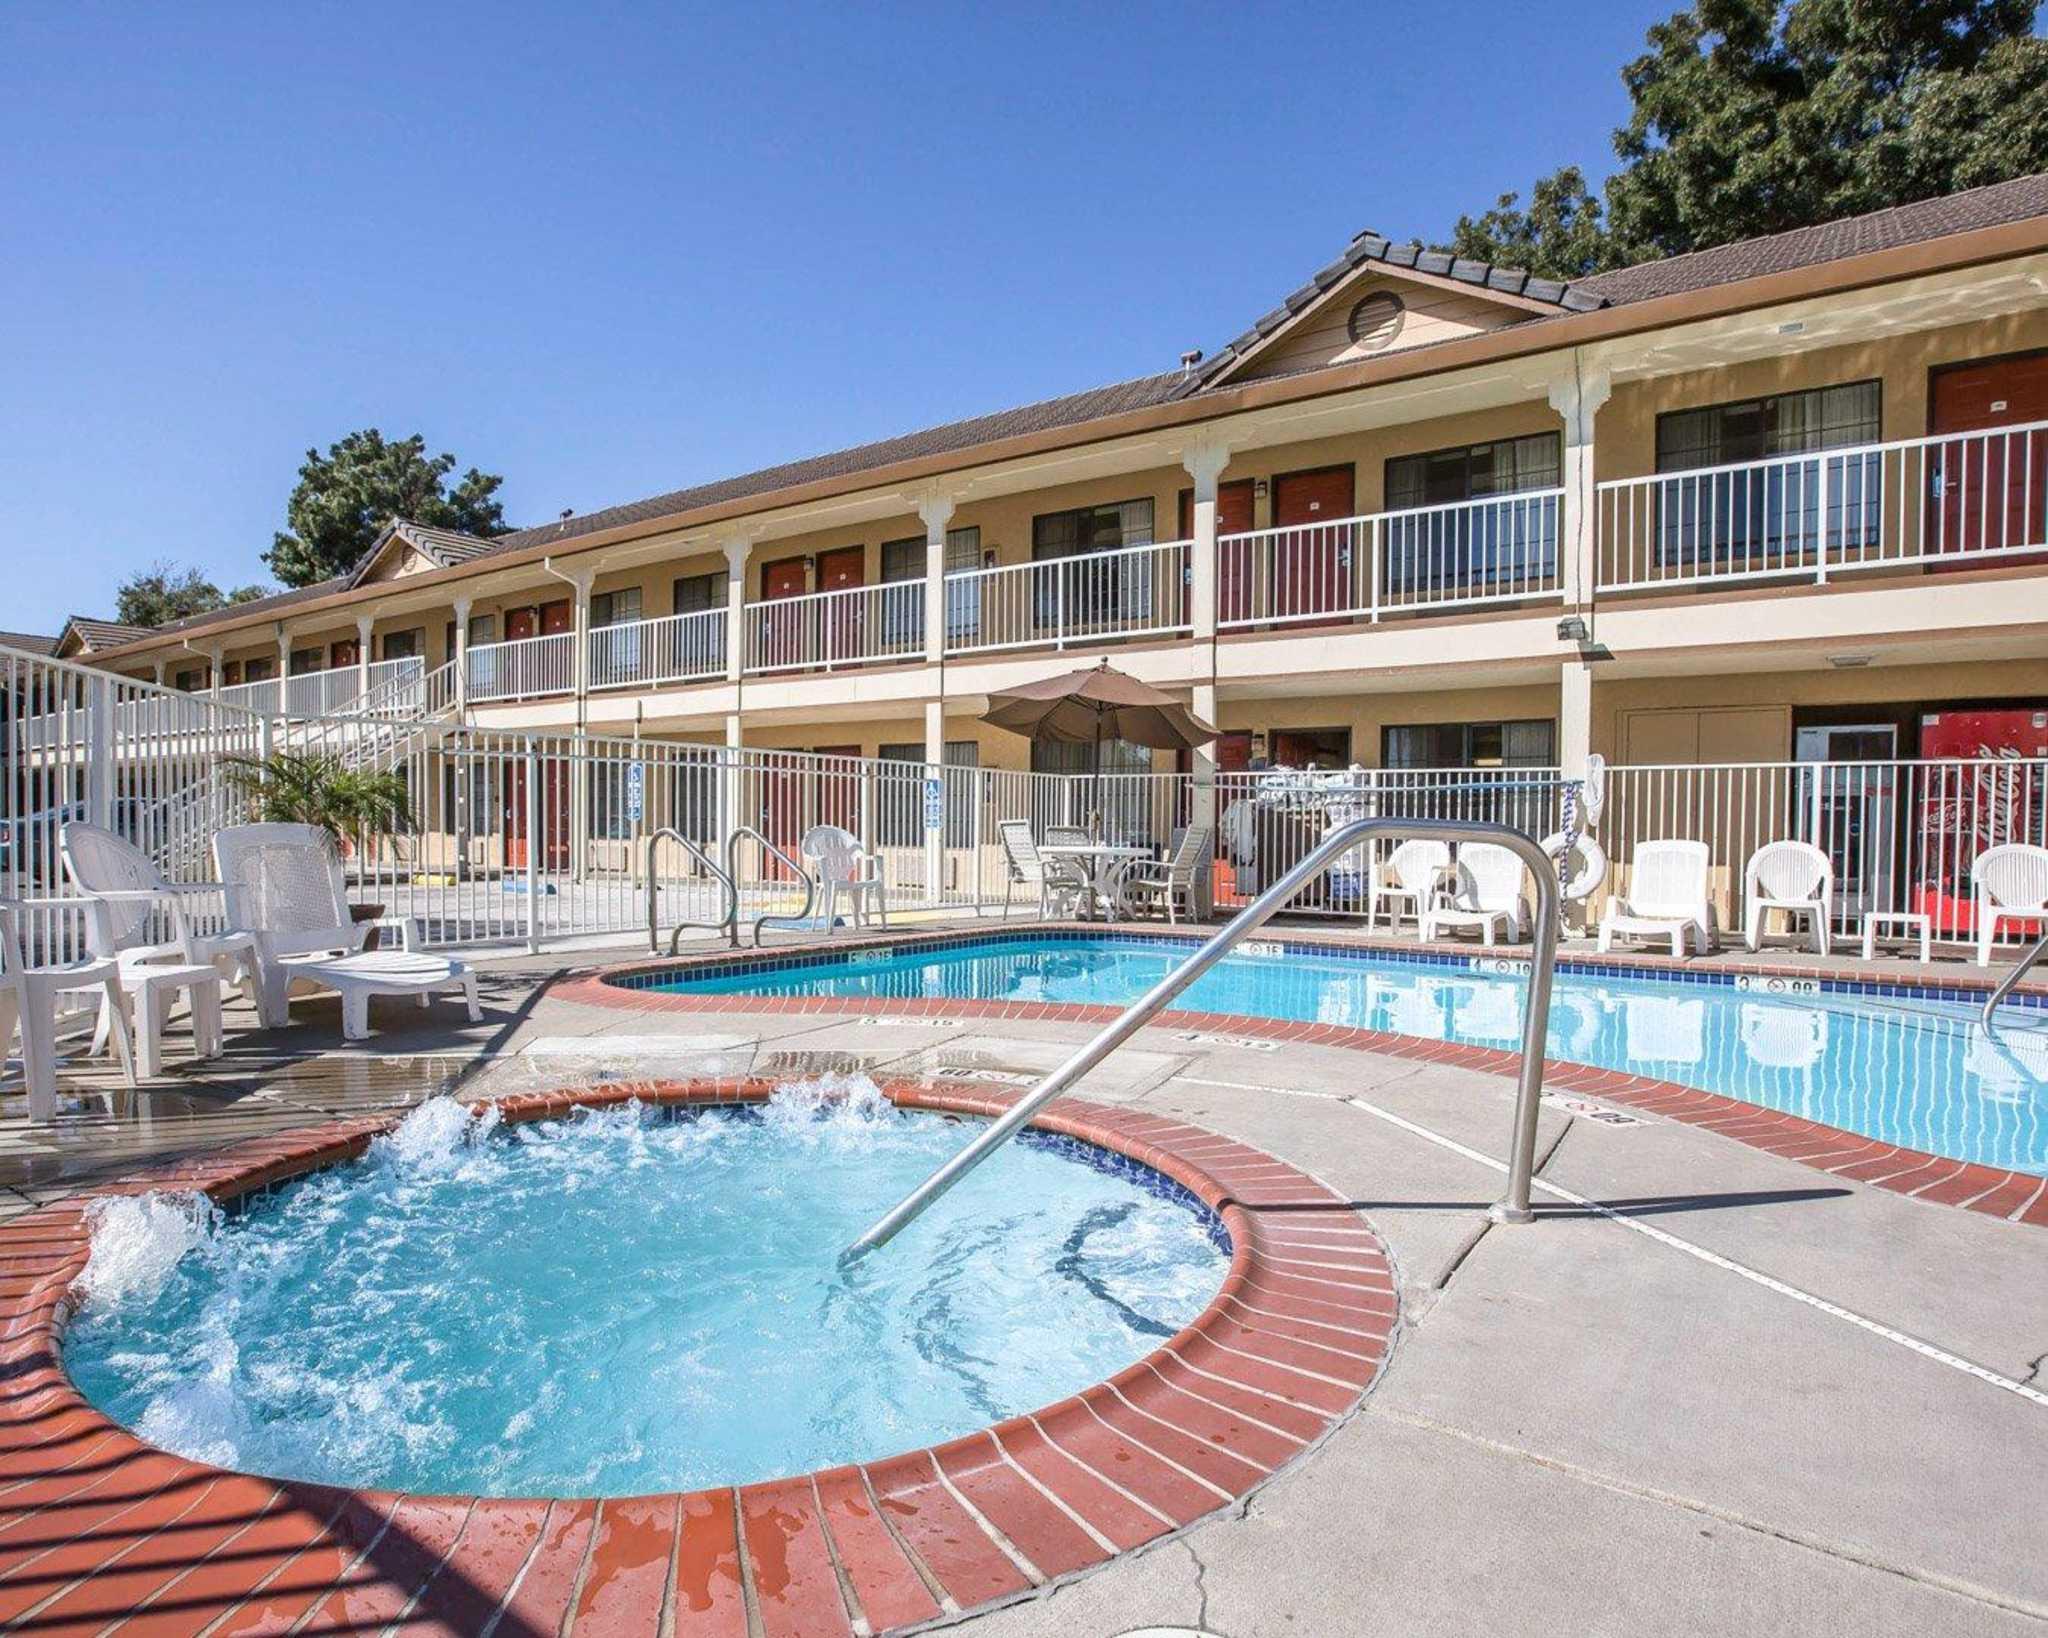 Quality Inn & Suites Woodland - Sacramento Airport image 13